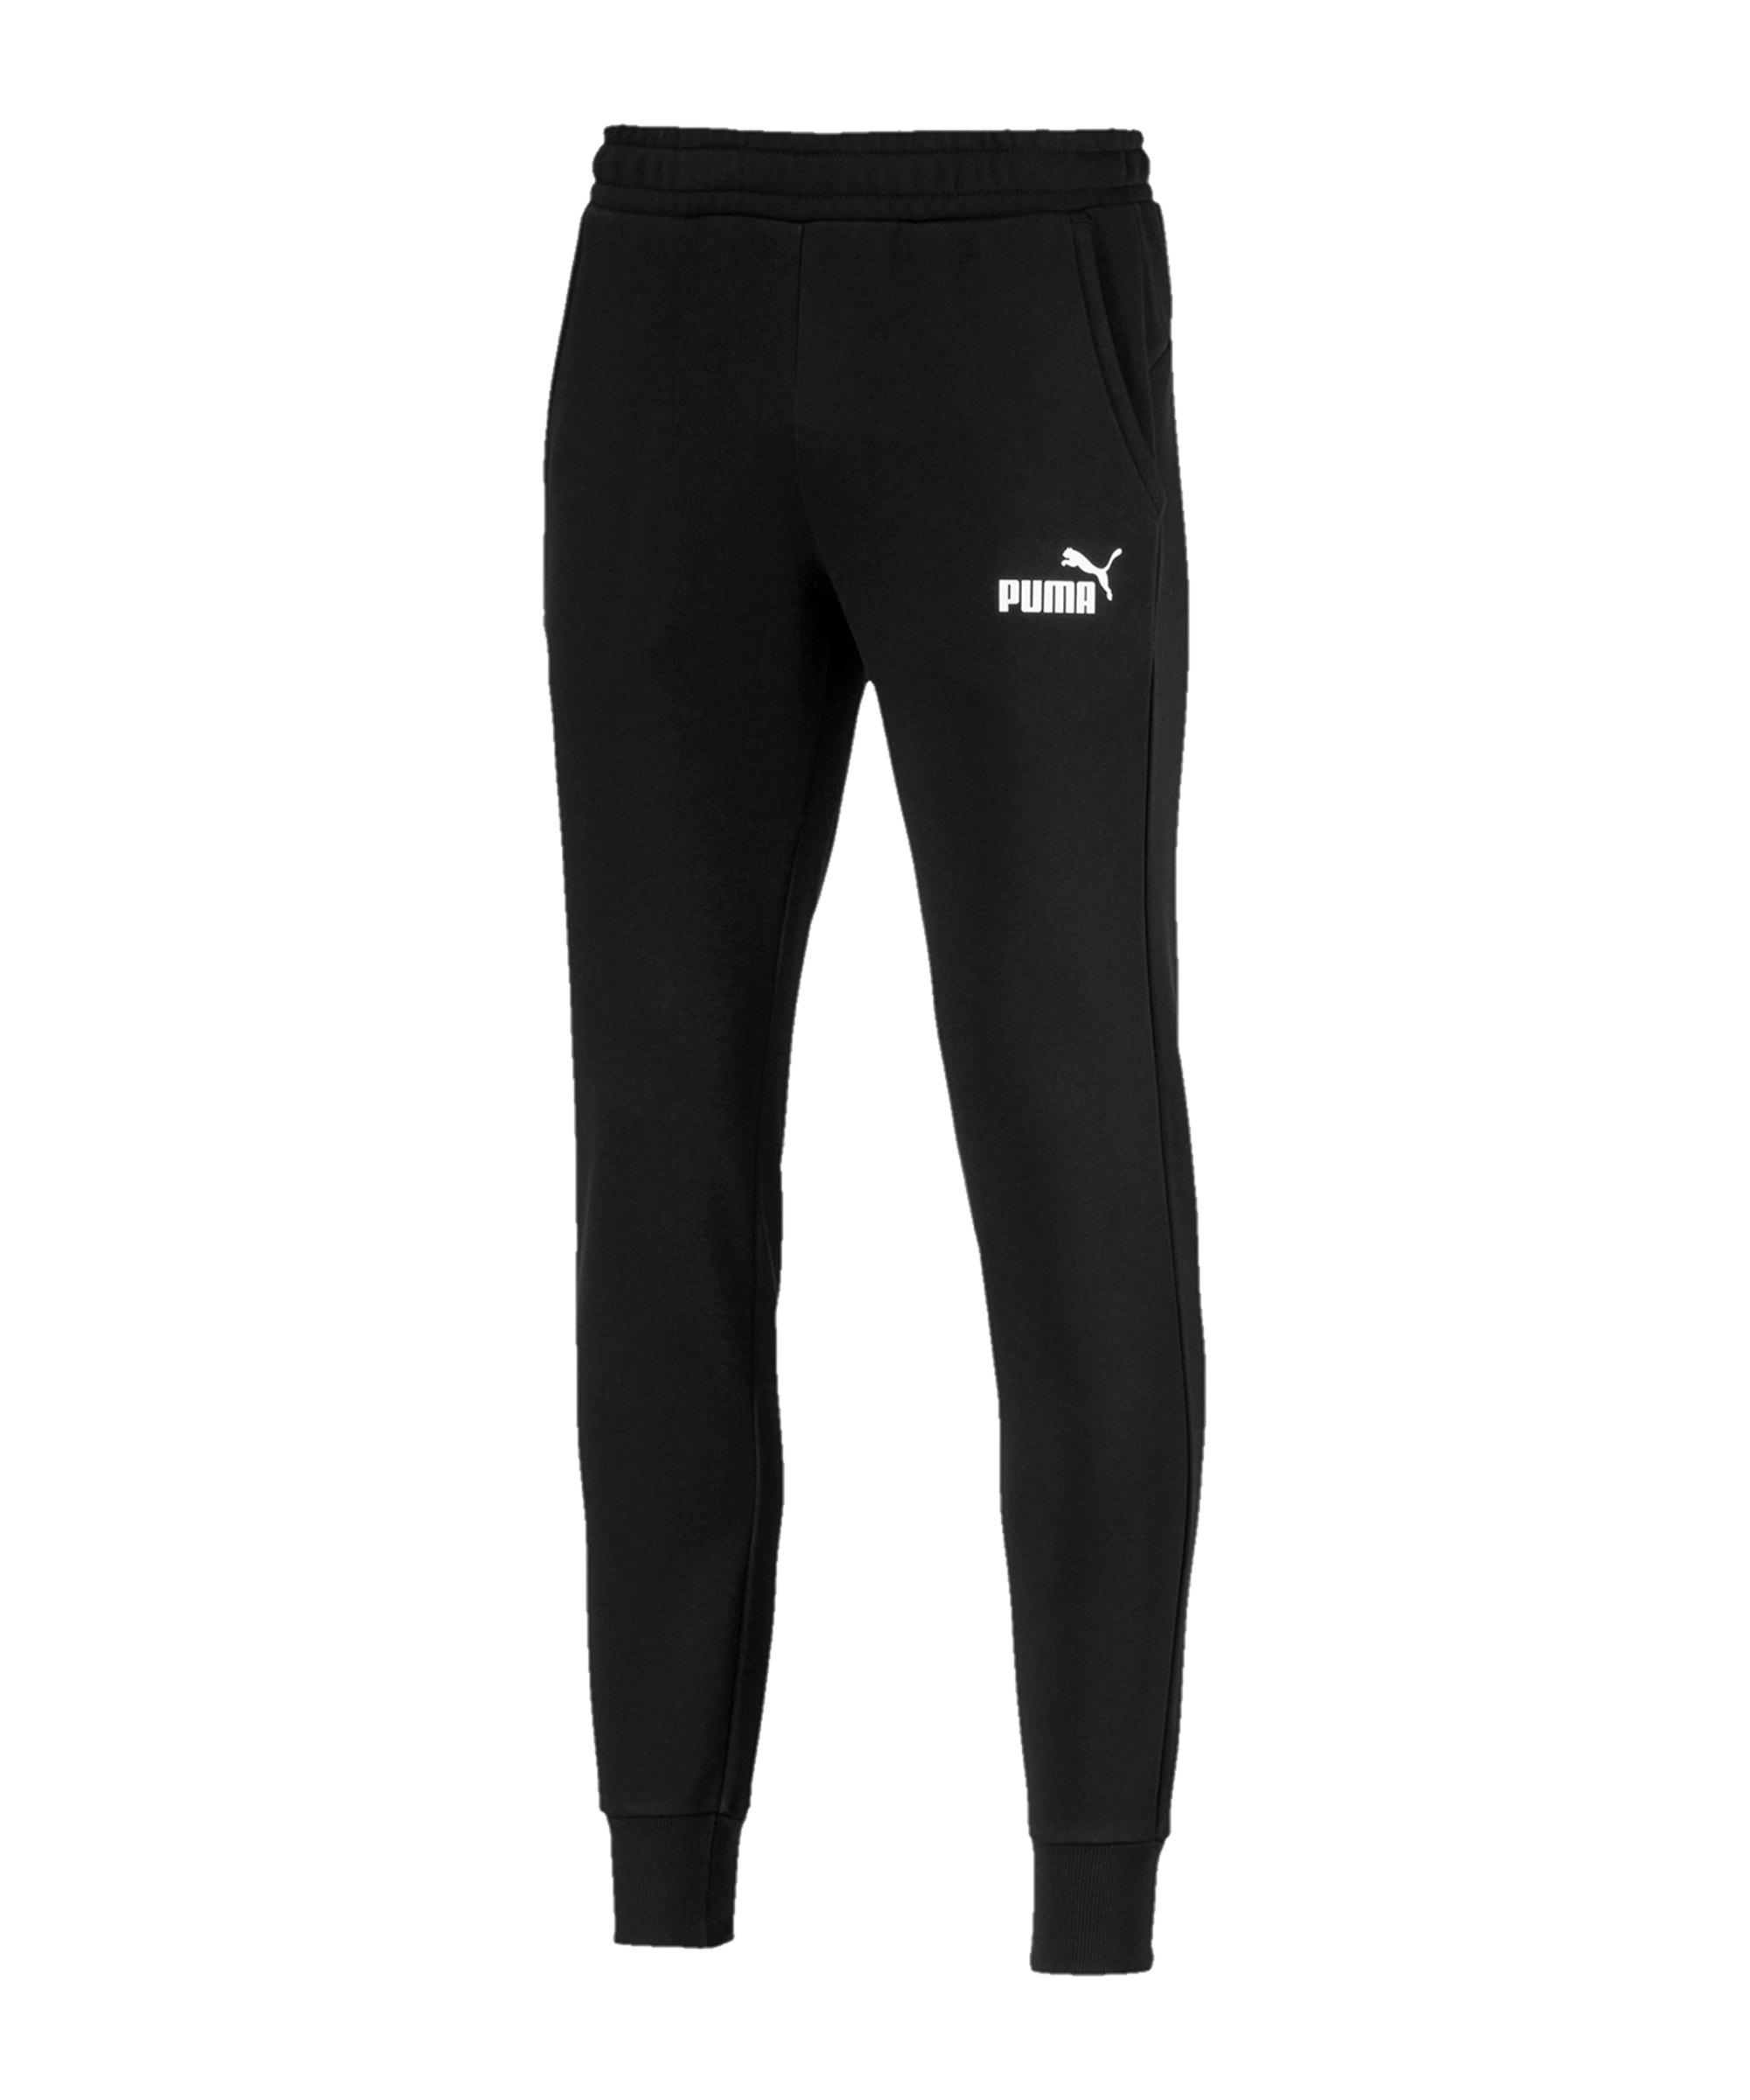 PUMA Essential Logo Pant Jogginghose Damen F01 - schwarz